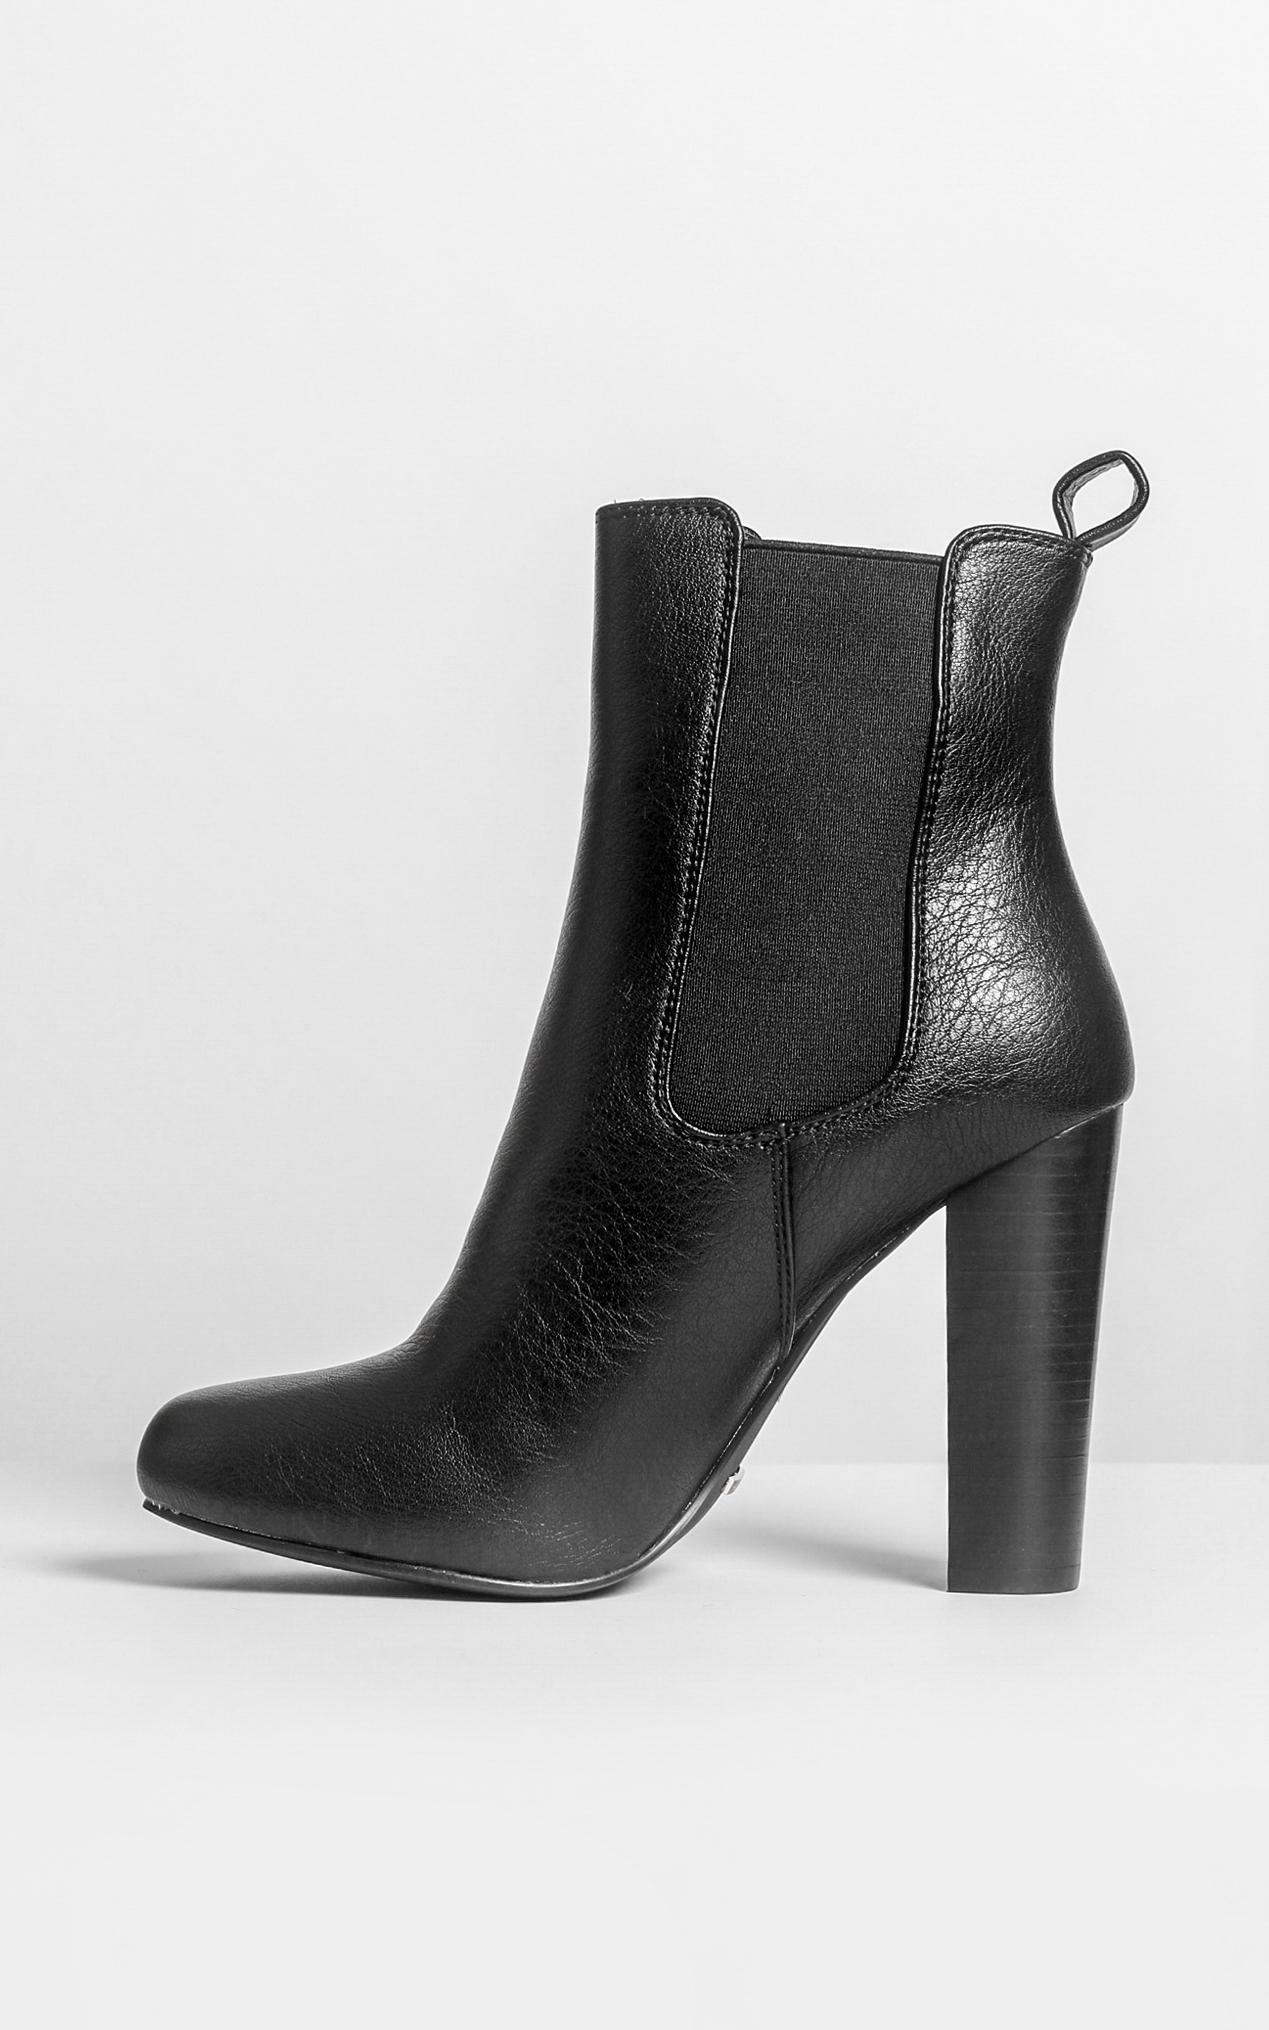 Billini - Lillia Boots in black - 10, Black, hi-res image number null